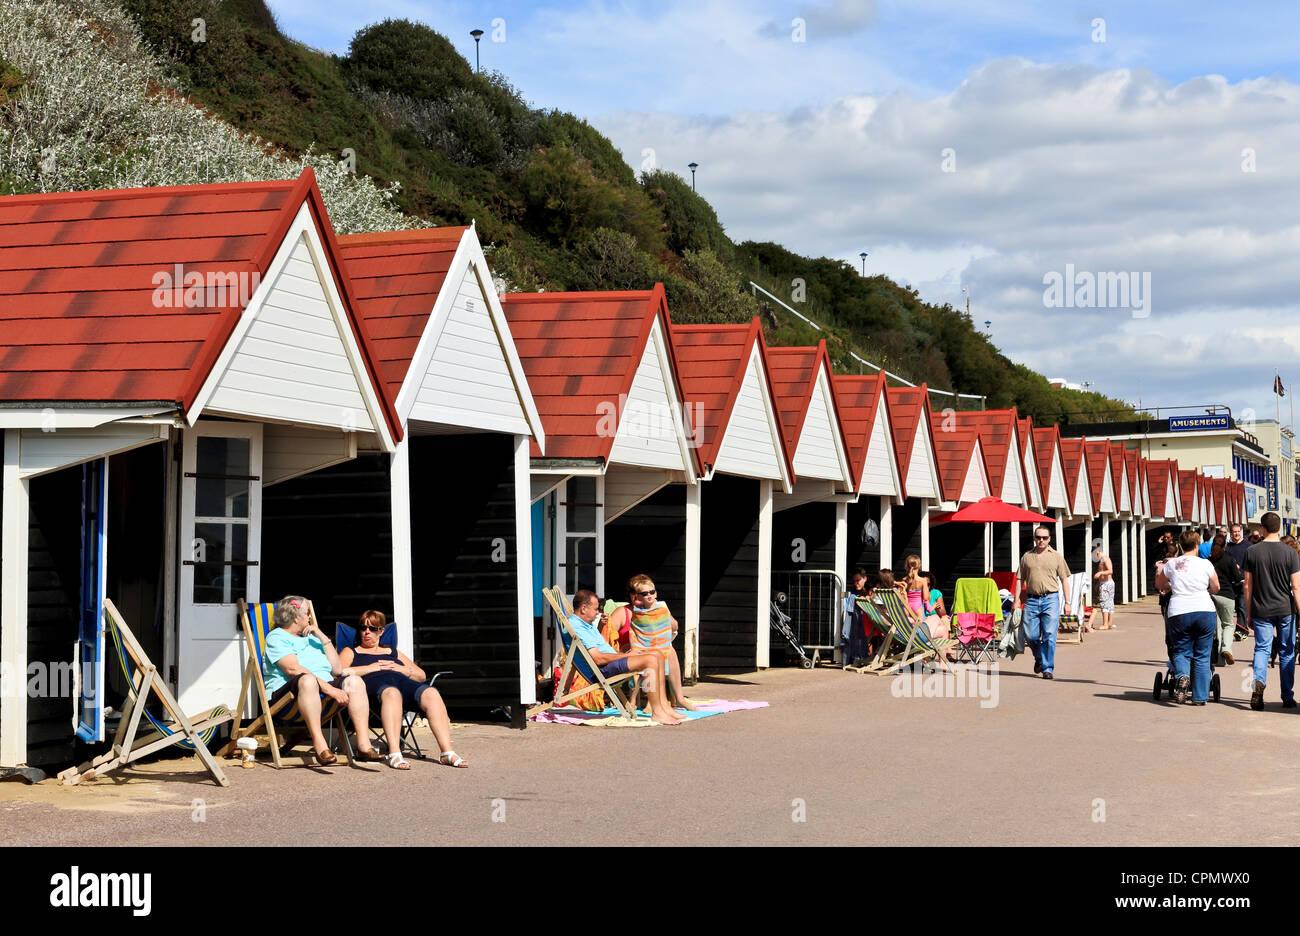 3958. Beach Huts on Promenade, Bournemouth, Dorset, UK - Stock Image